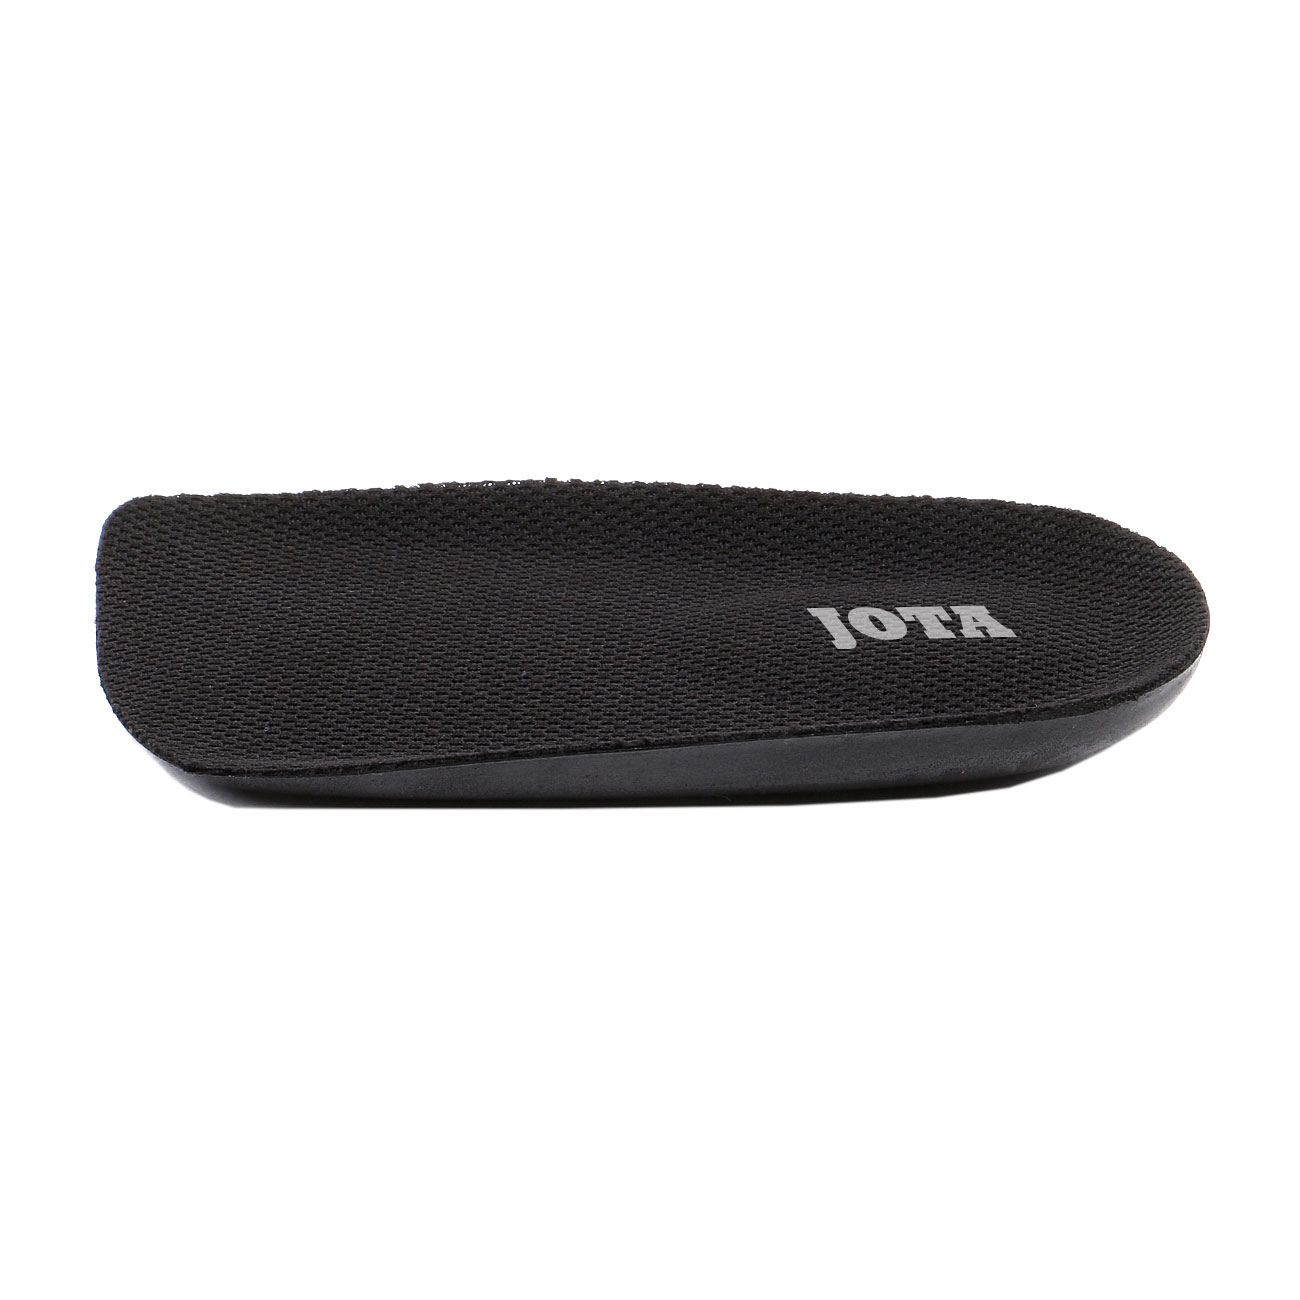 KIH1, Comfort Cushion Half Heel Shoe Sole, 3/8